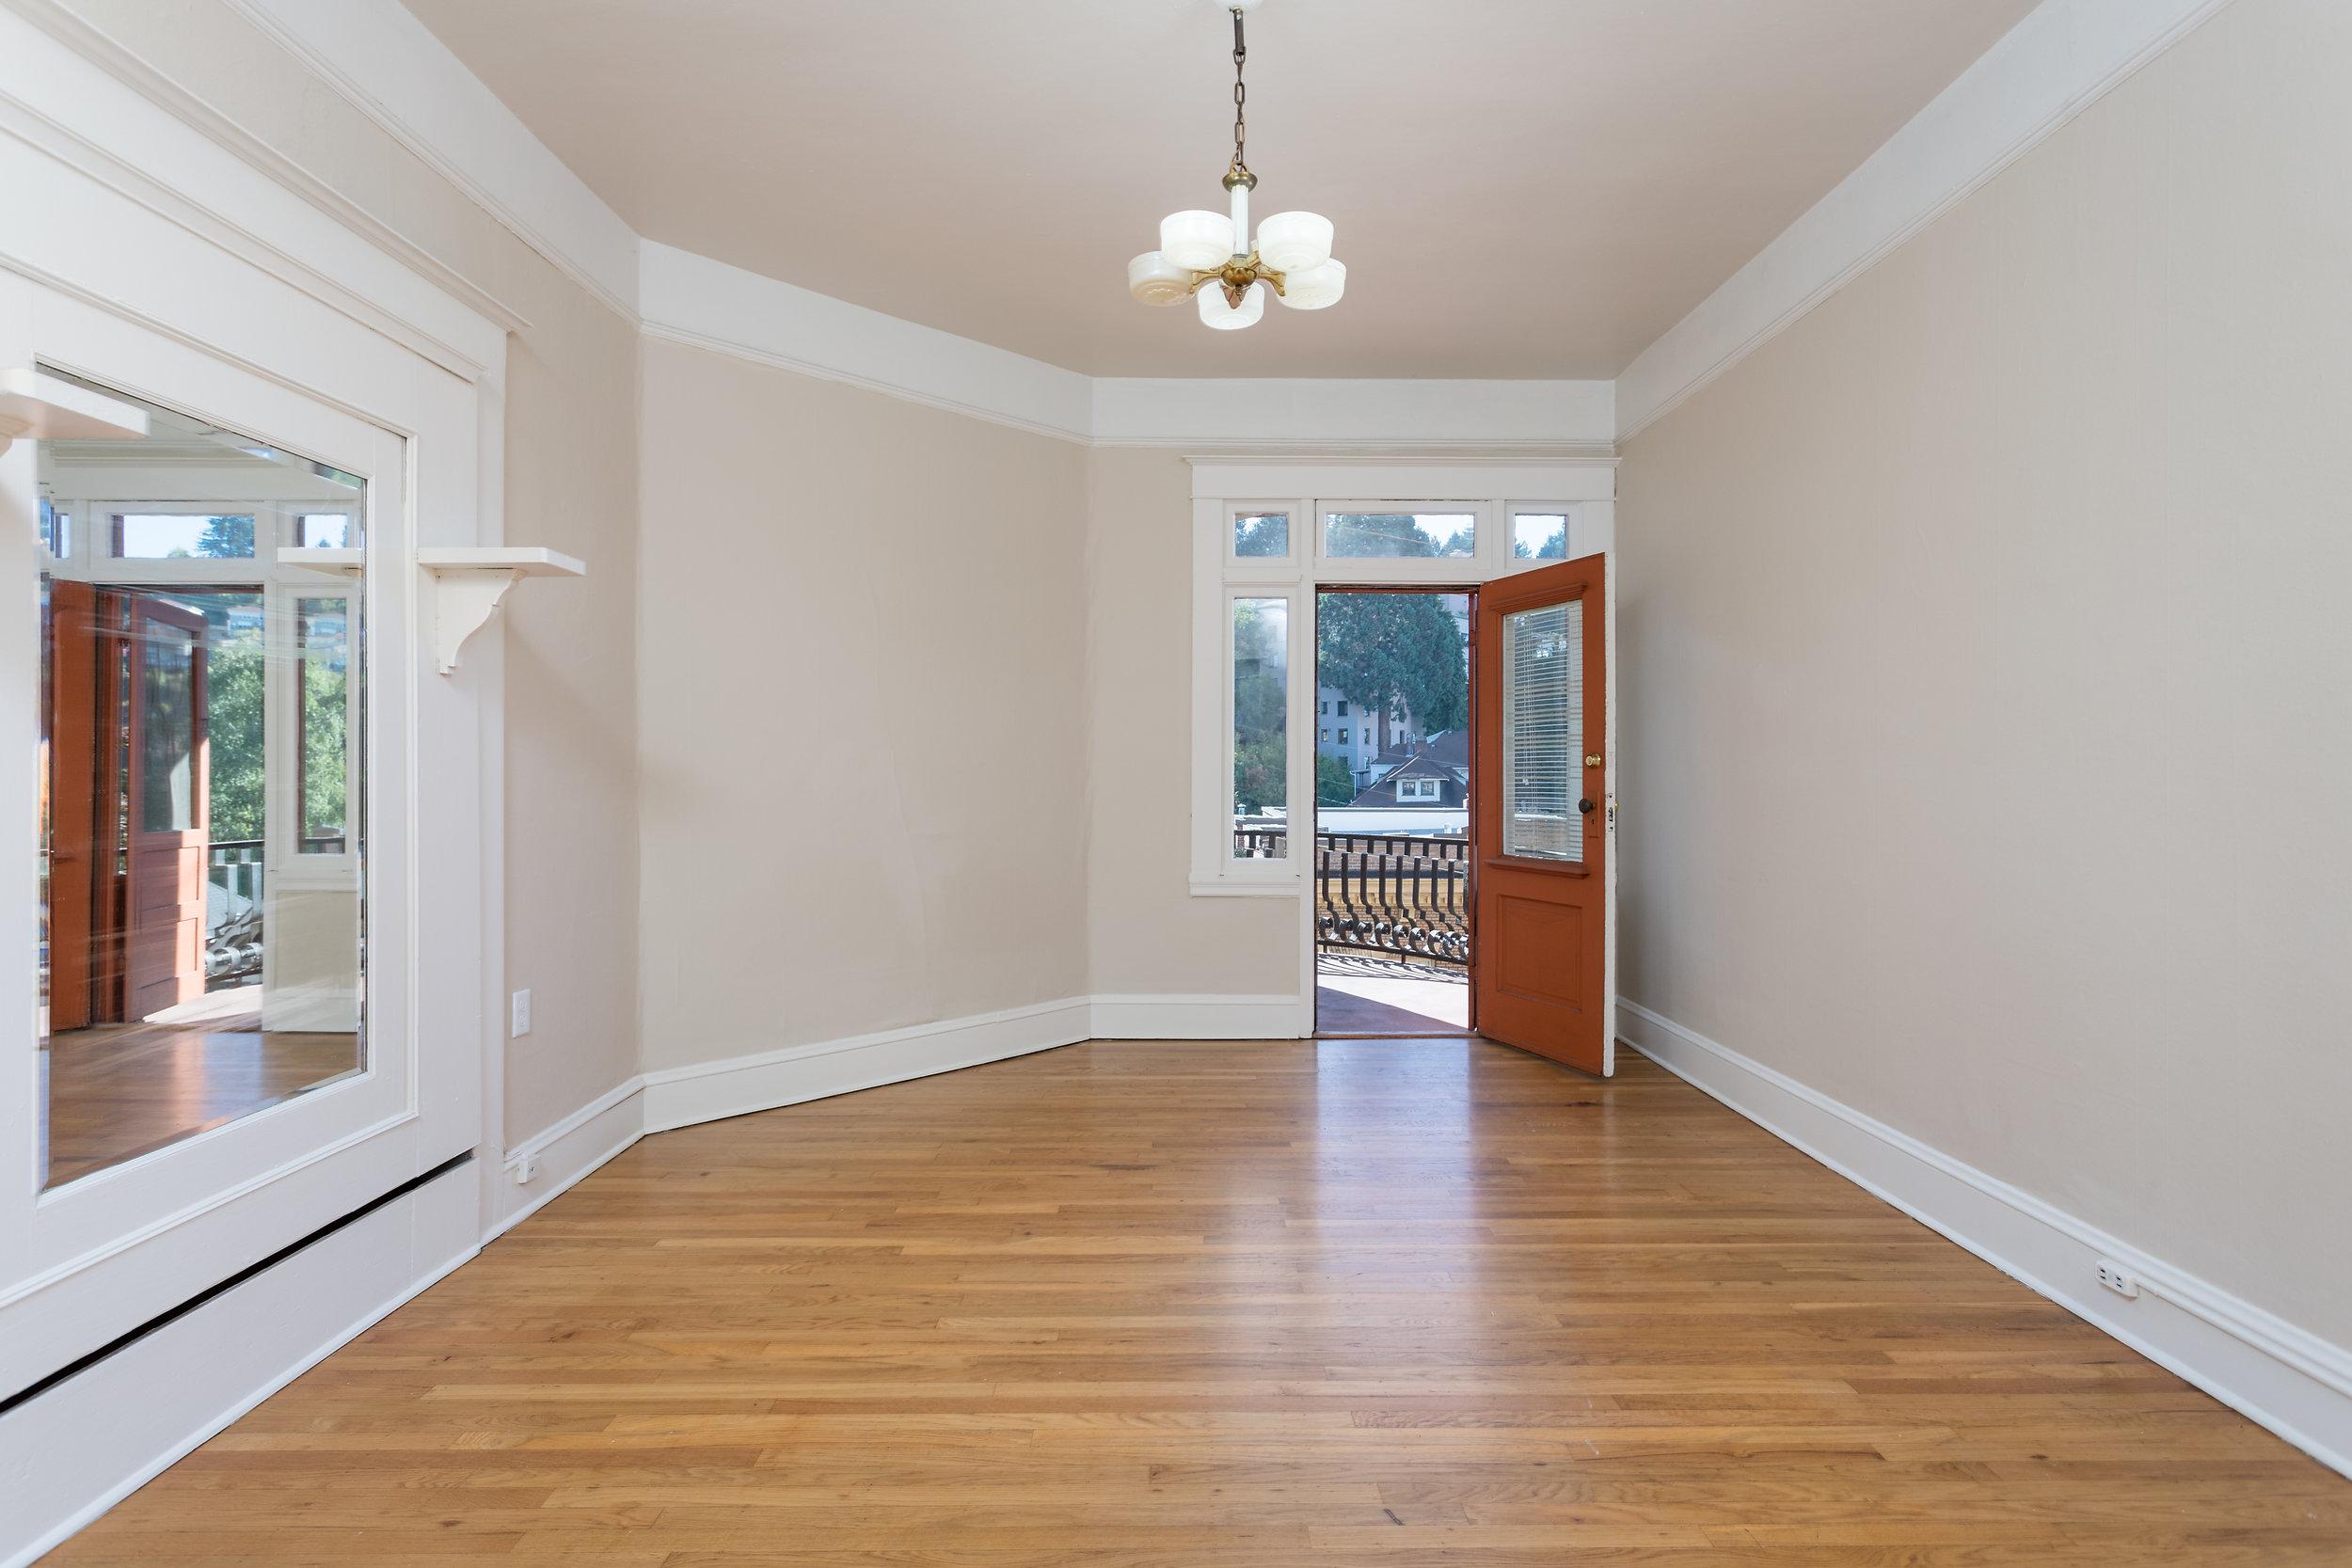 Wood Floors and Balconies